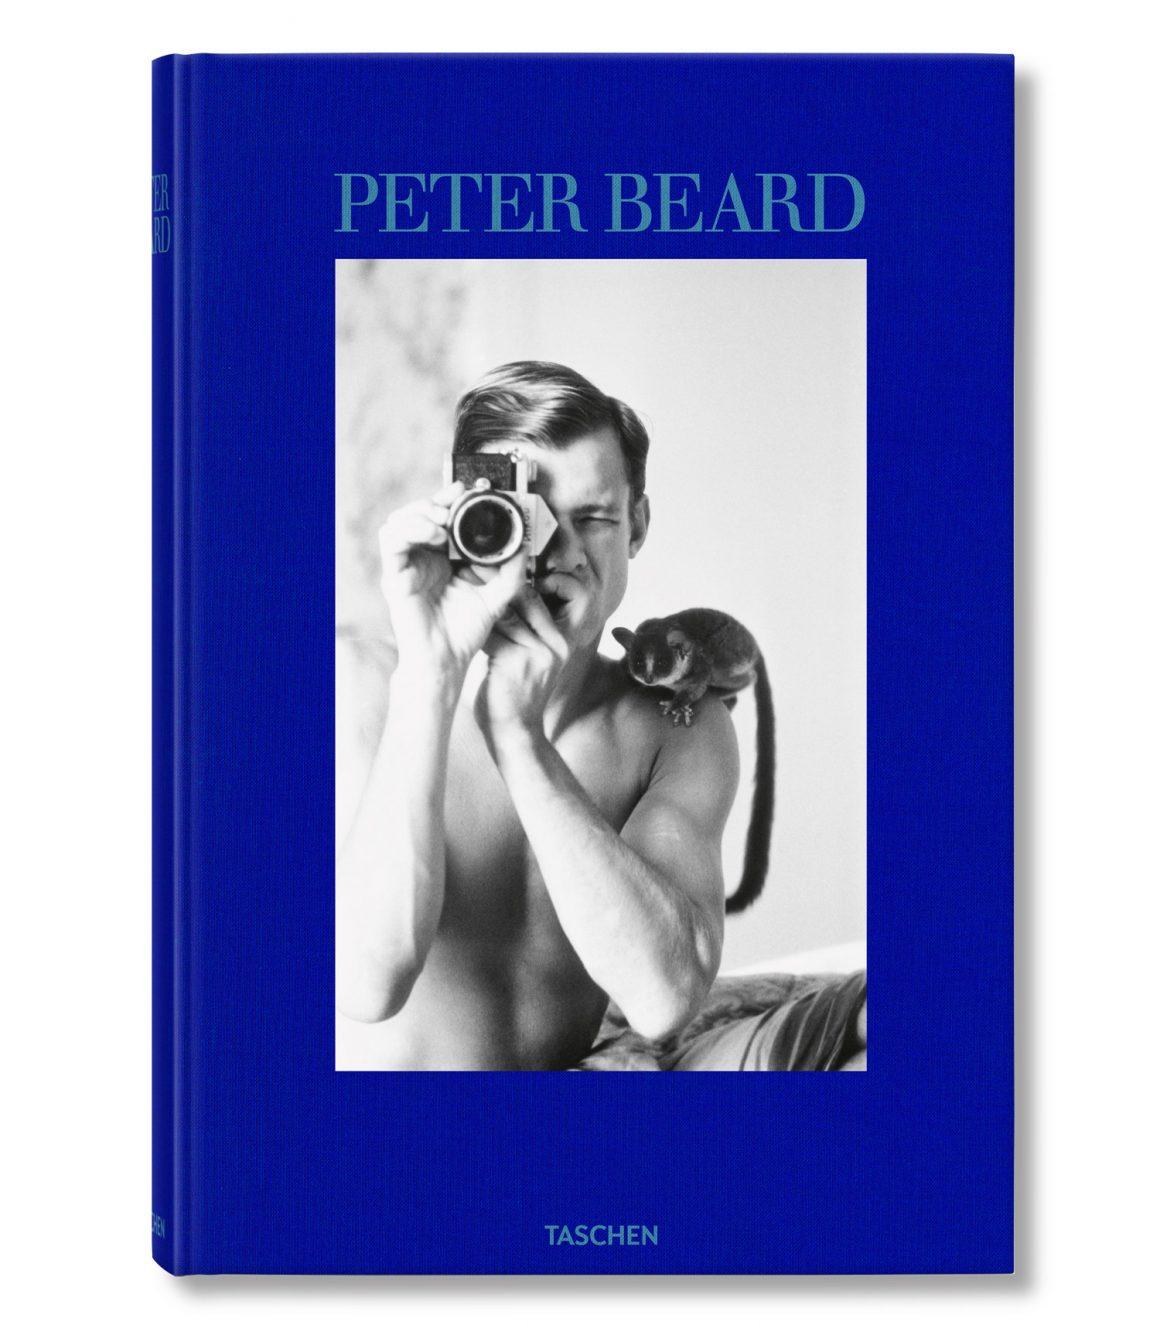 Le livre « Peter Beard » en format XL